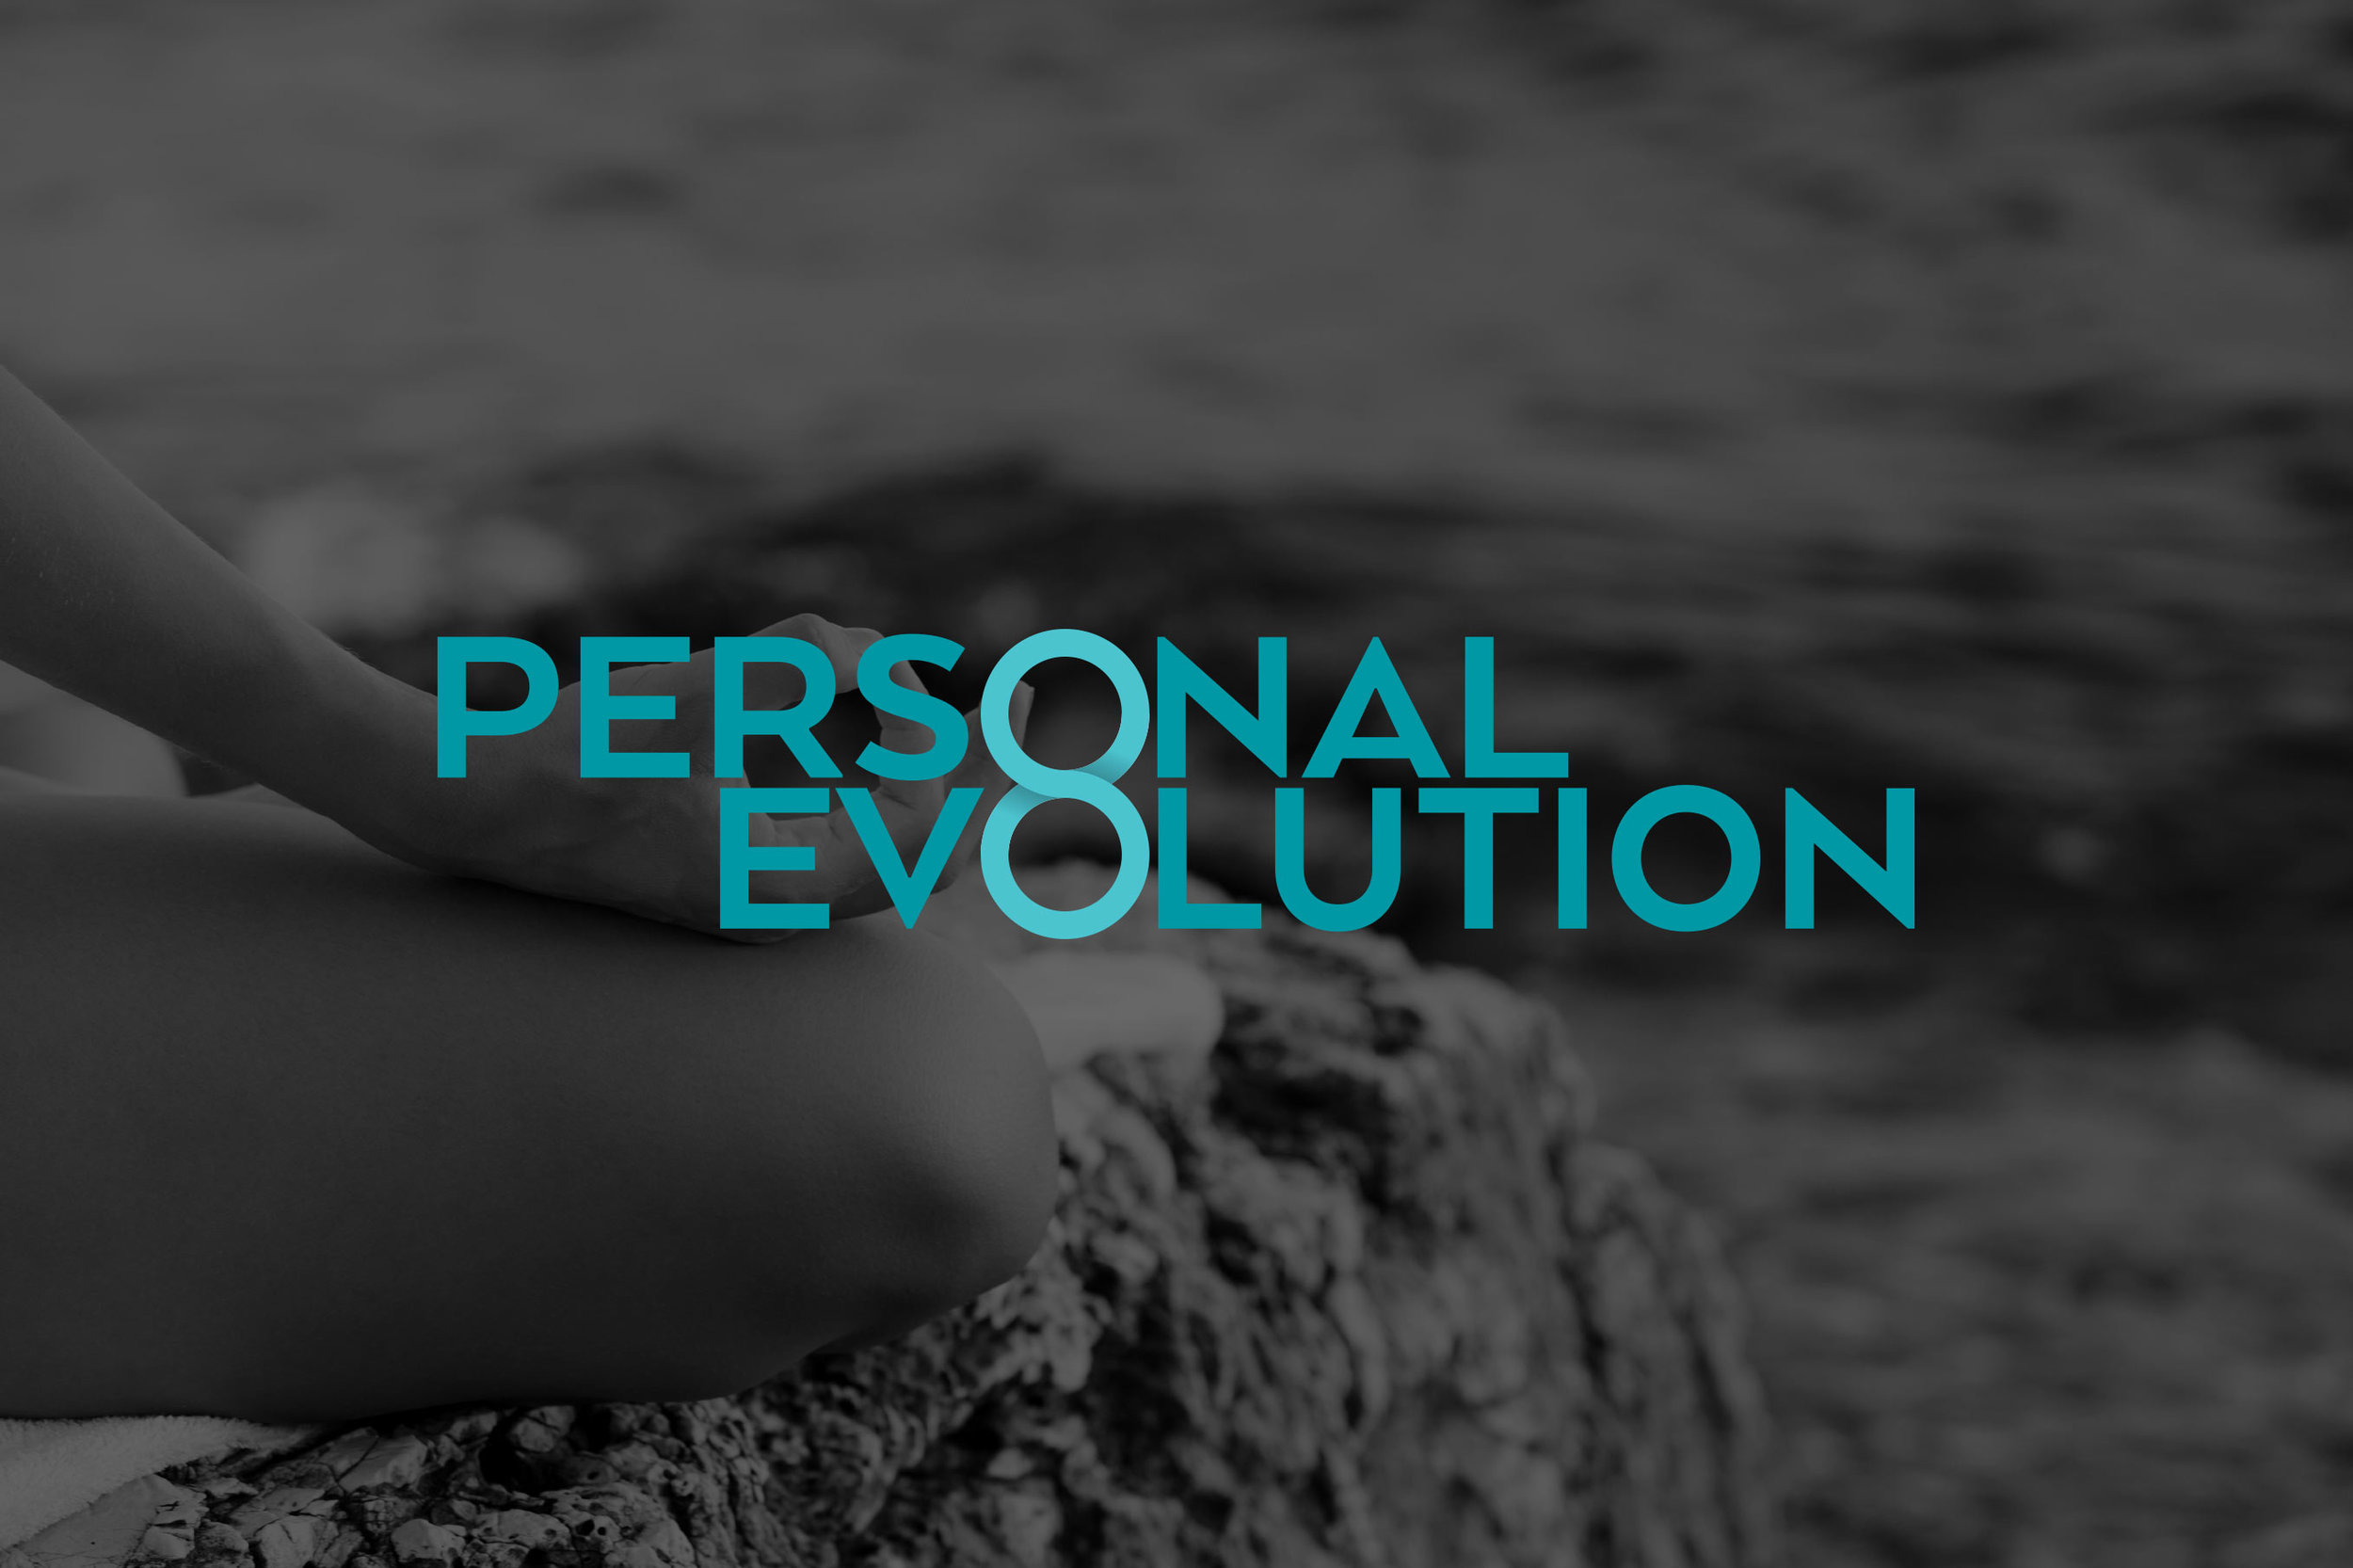 personal evolution wordmark